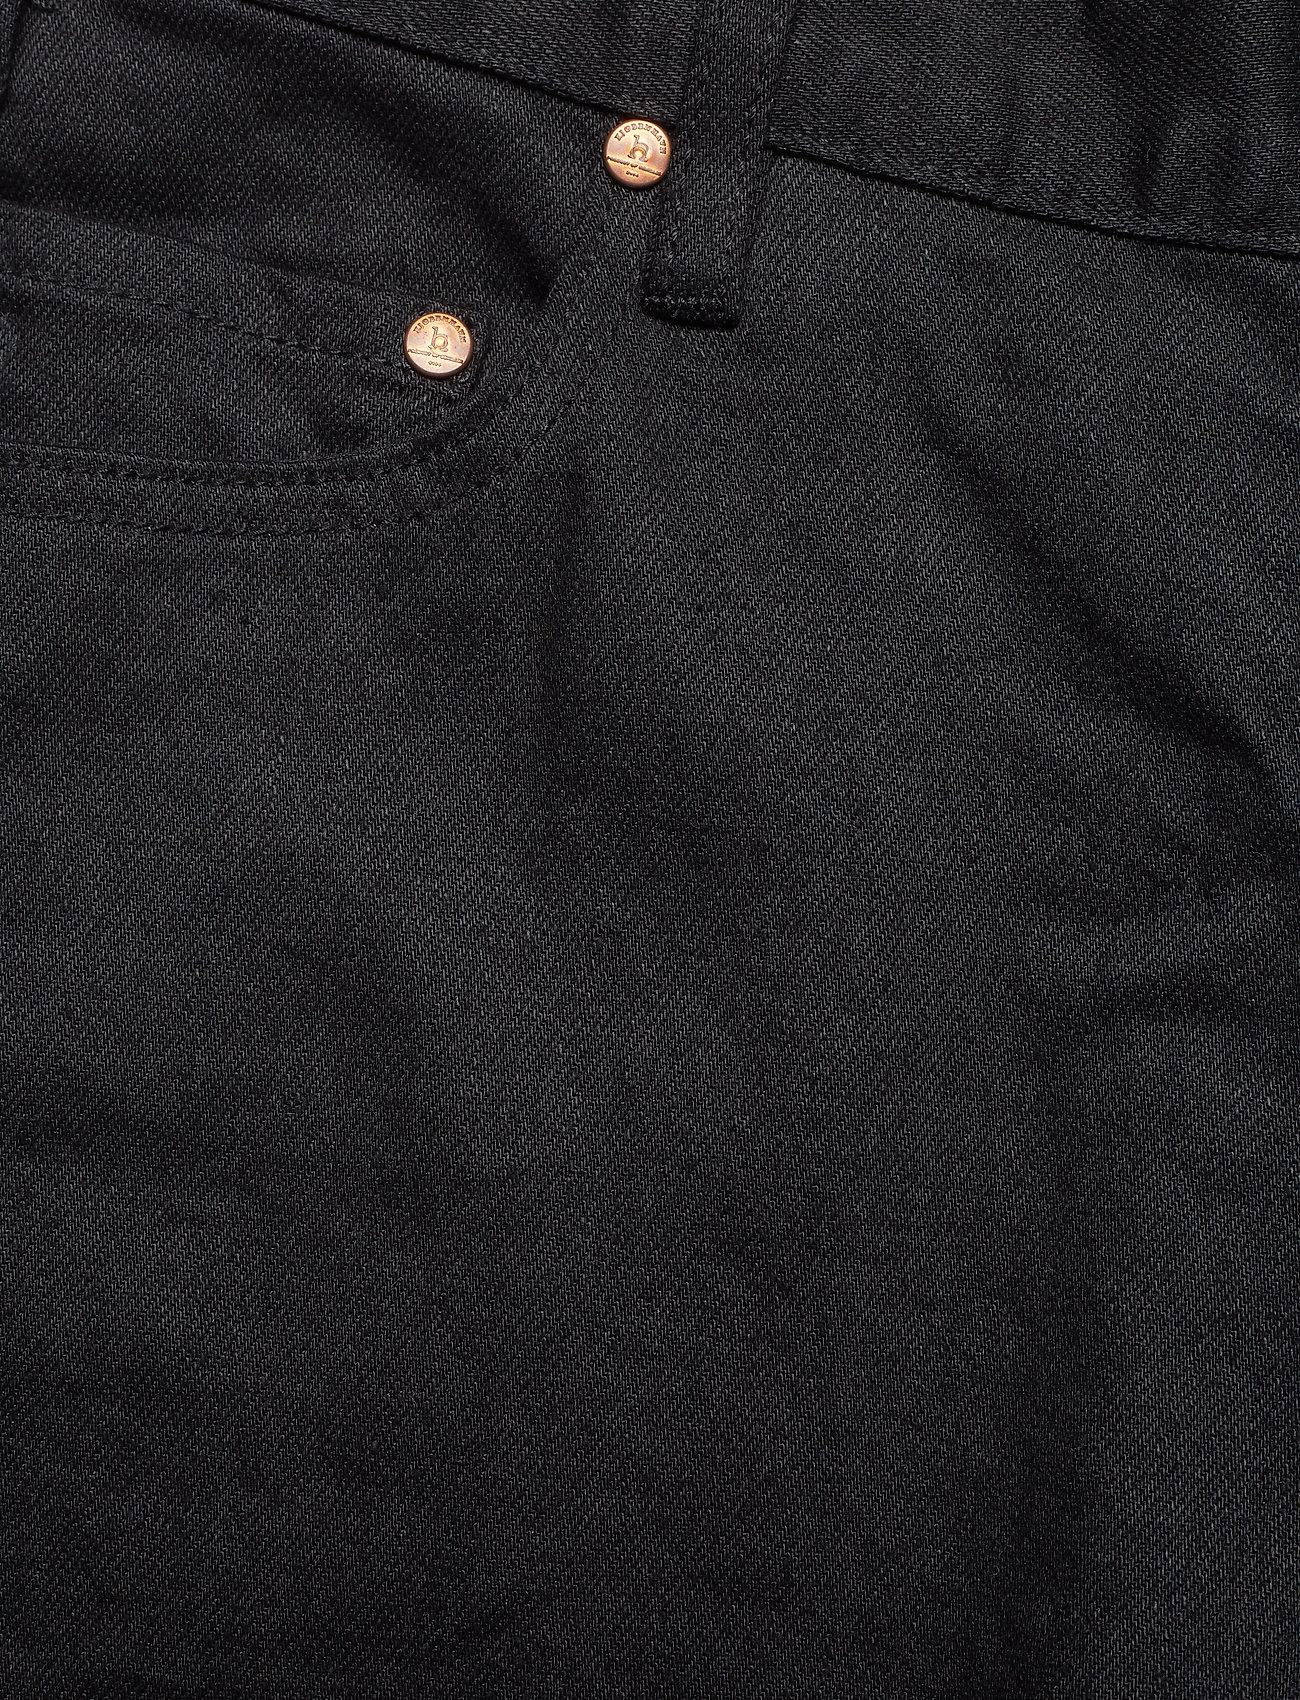 BlackHan Jeansblack Fit Kjøbenhavn Lean Fit BlackHan Lean Lean Fit Jeansblack Jeansblack Kjøbenhavn QeCBrdxoW